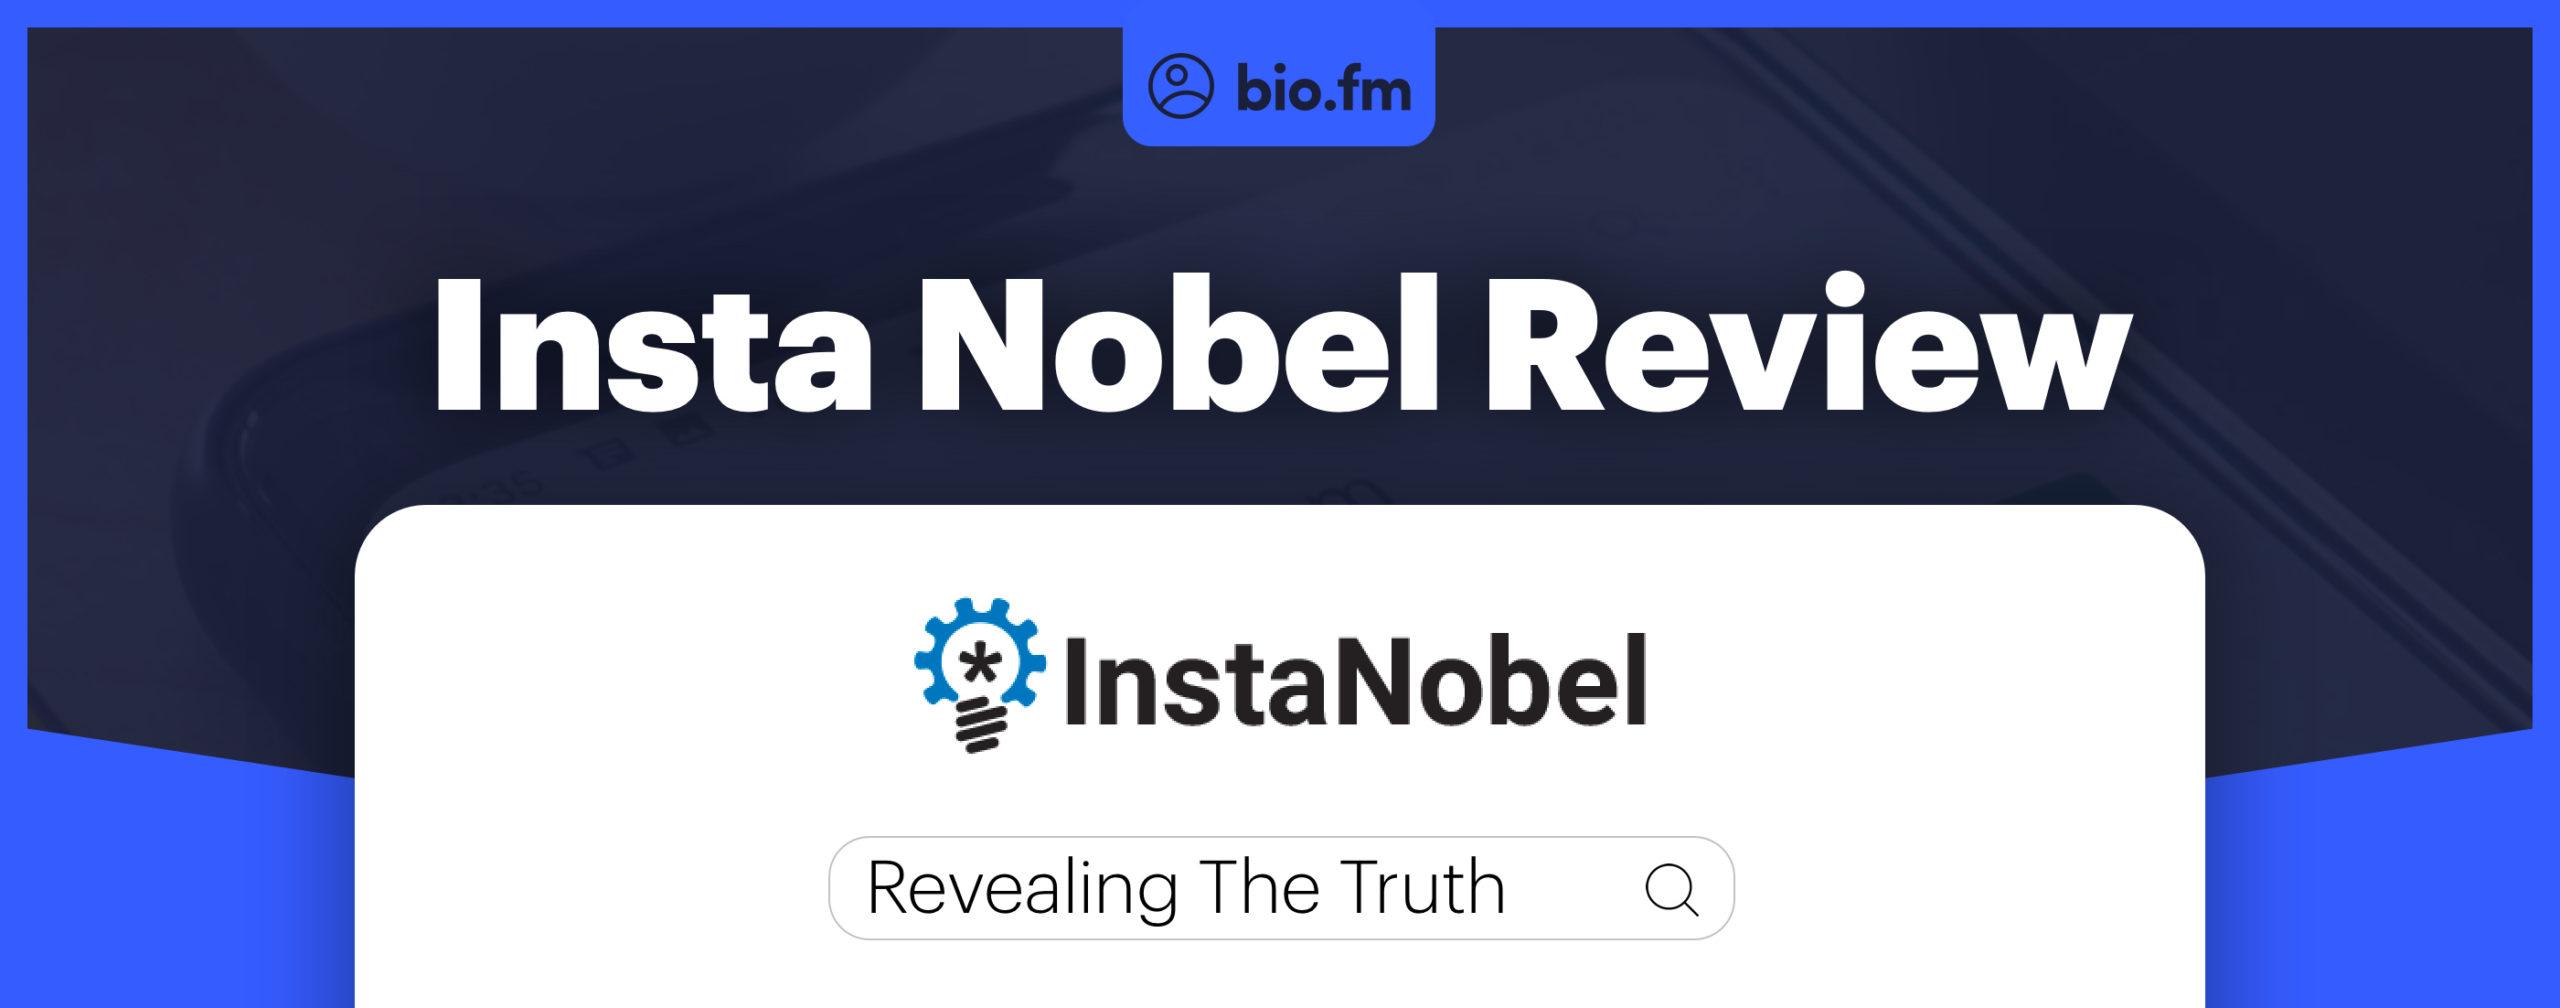 instanobel review featured image